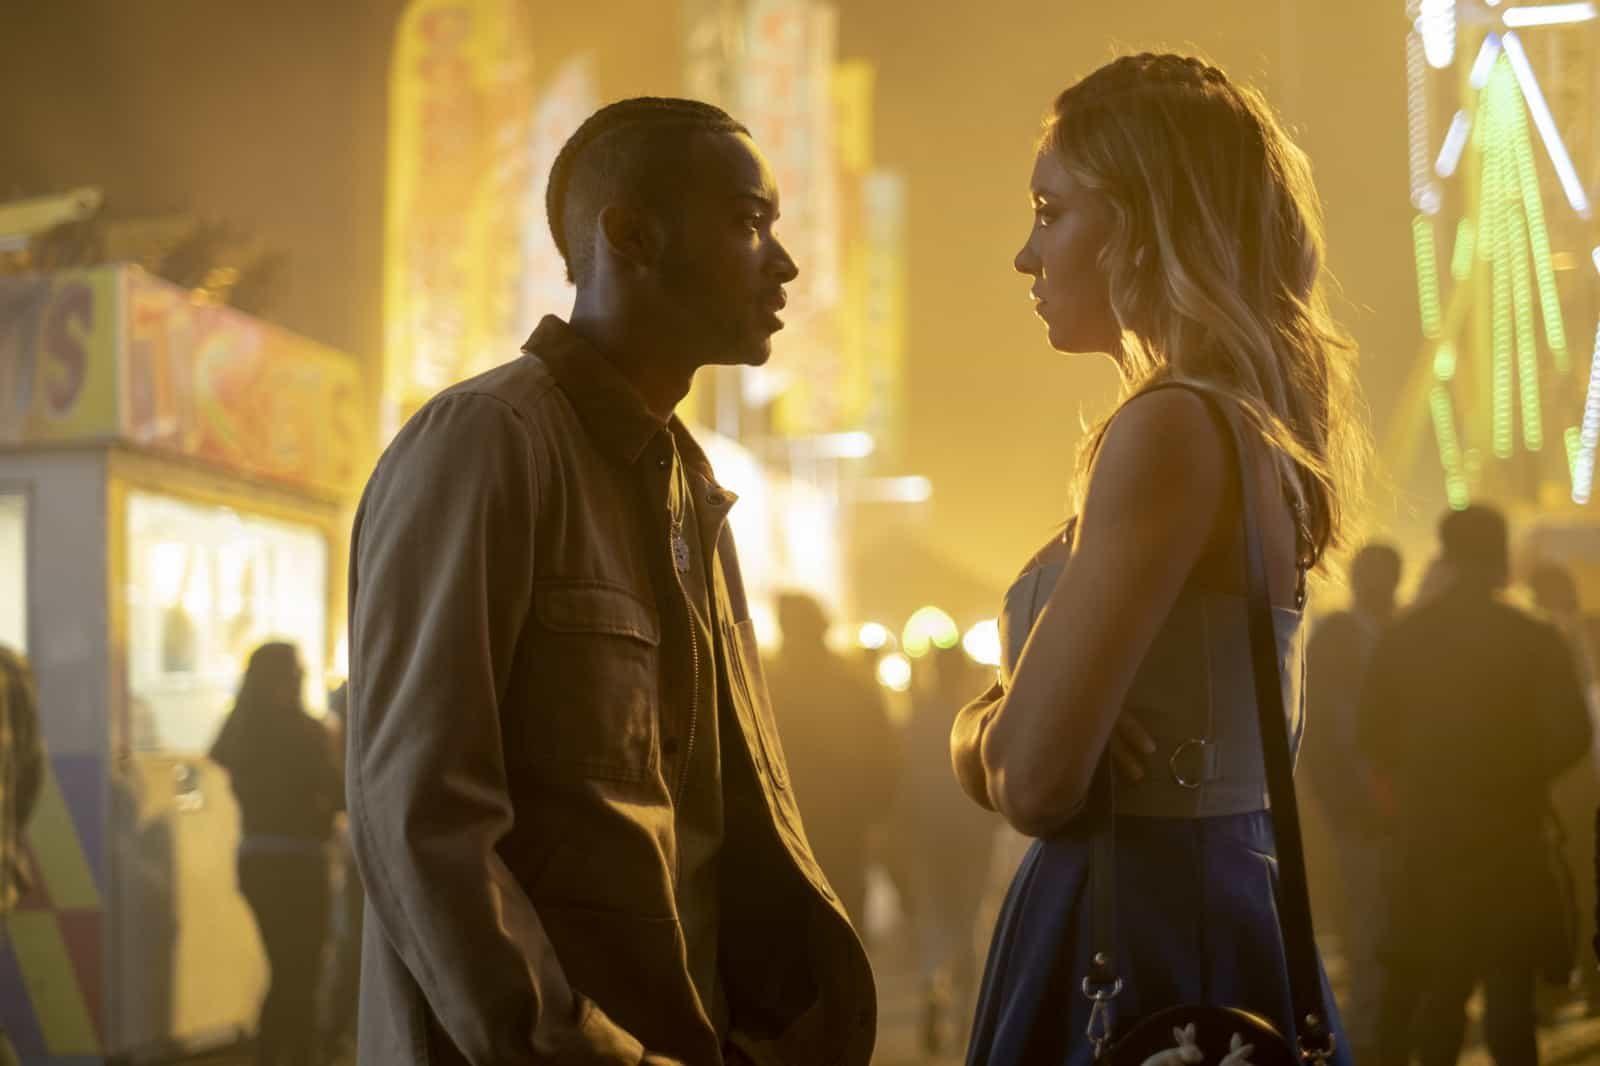 McKay (Algee Smith) y Cassie (Sydney Sweeney) en Euphoria 1x04